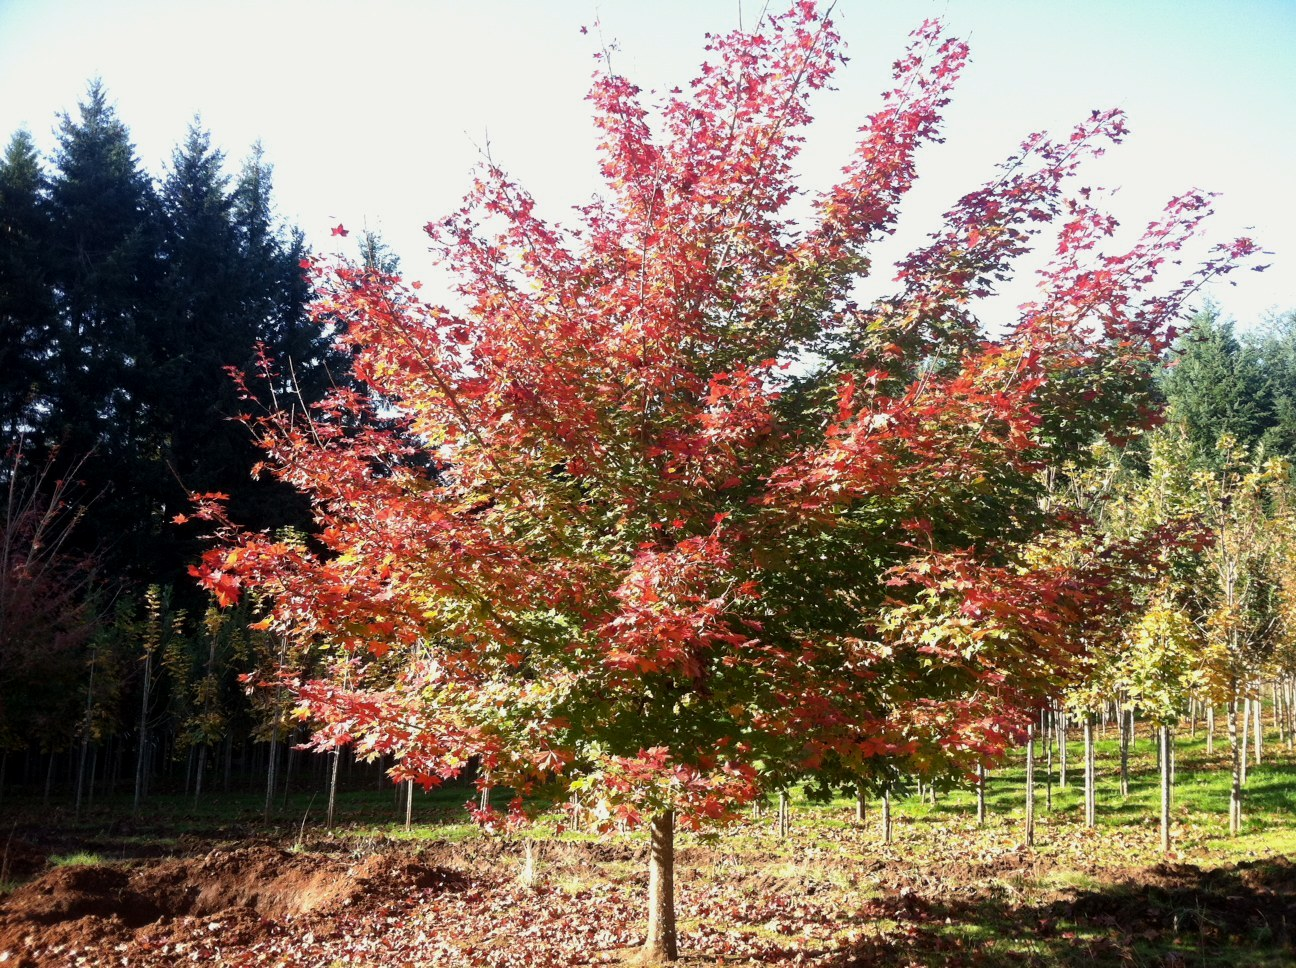 Acer truncatum x Acer platanoides  'Keithsform' (Norwegian Sunset Maple) Specimen